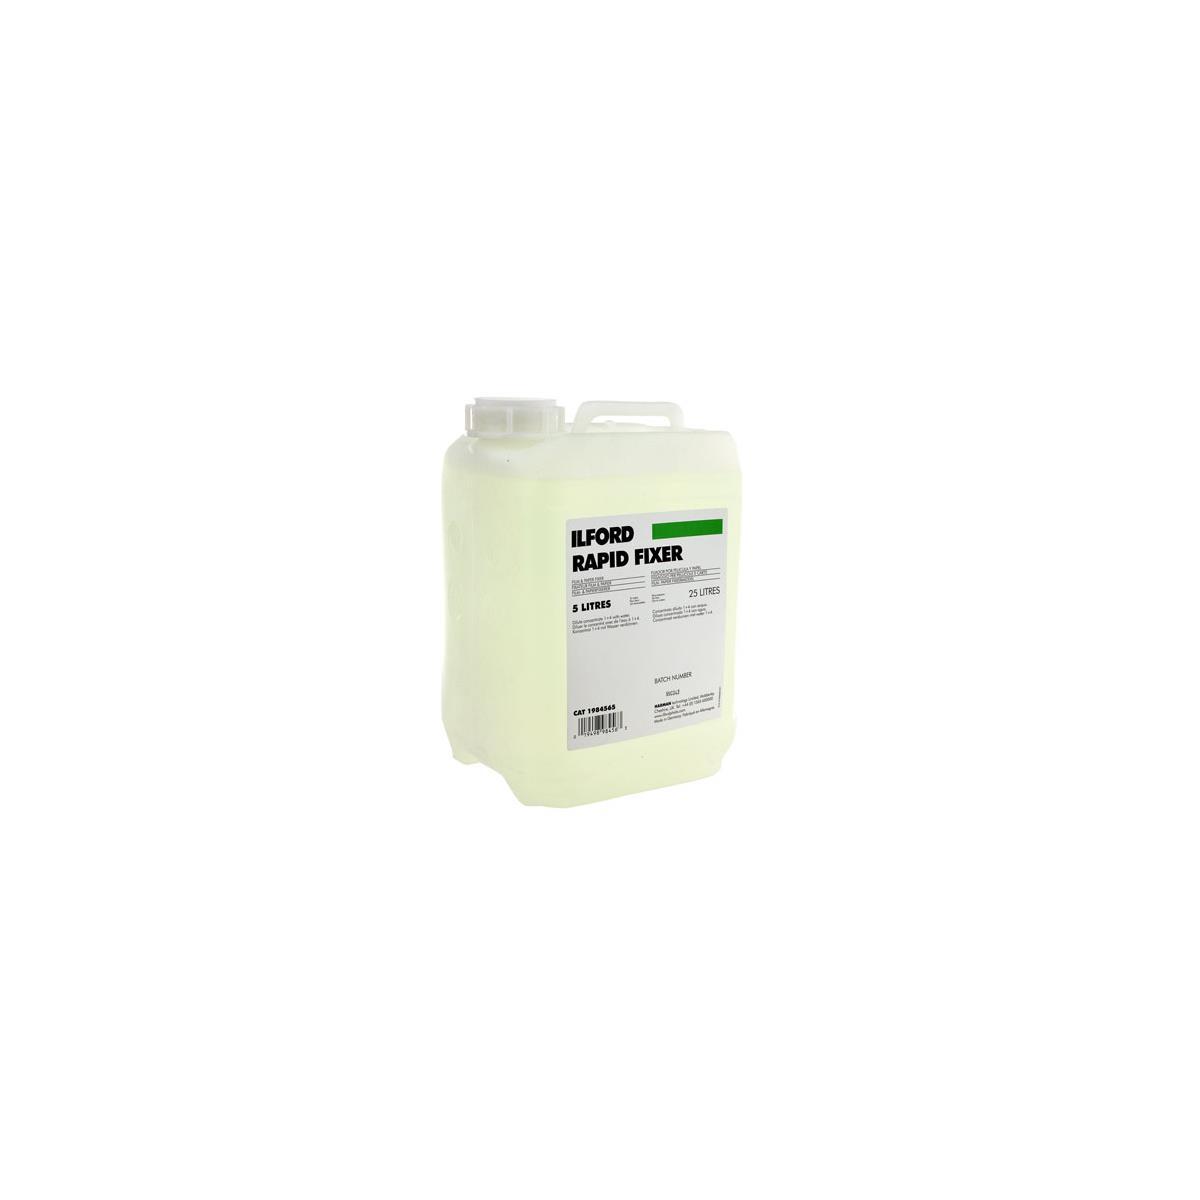 Ilford 1984565 Rapid Fixer Liquid 5Liter